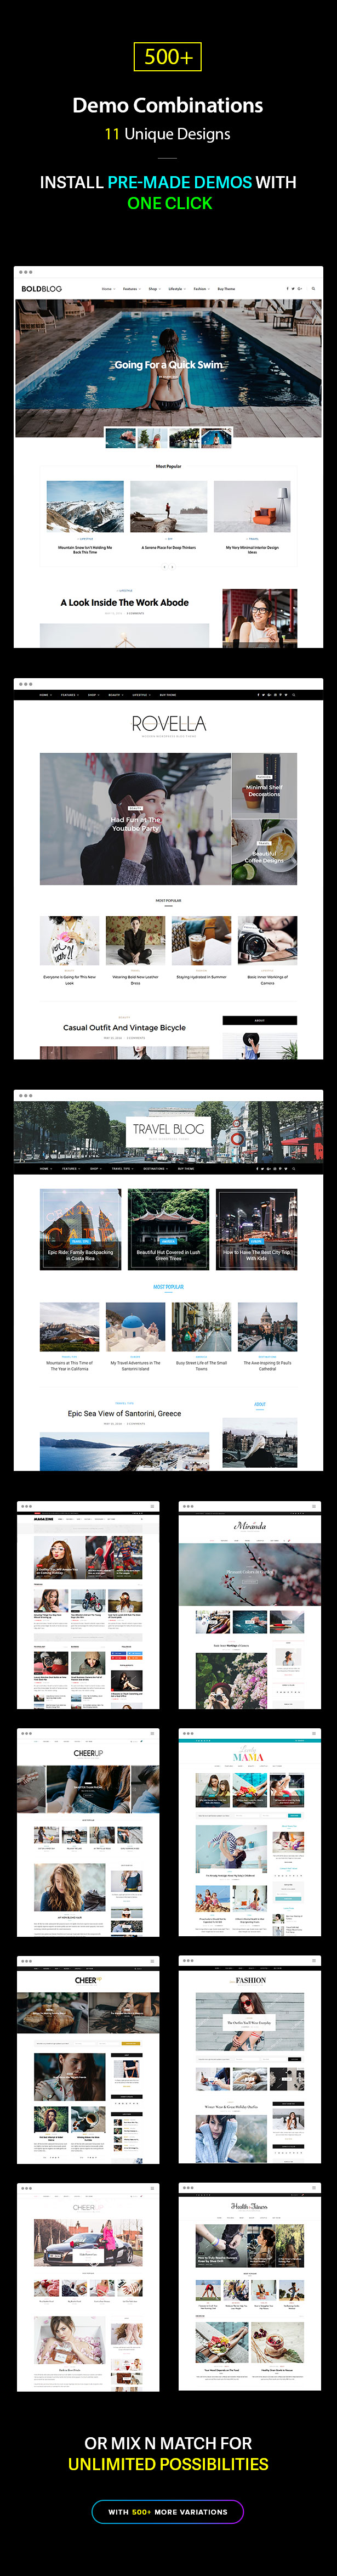 Multiple Blog and Magazine Layouts, 11+ Unique Designs